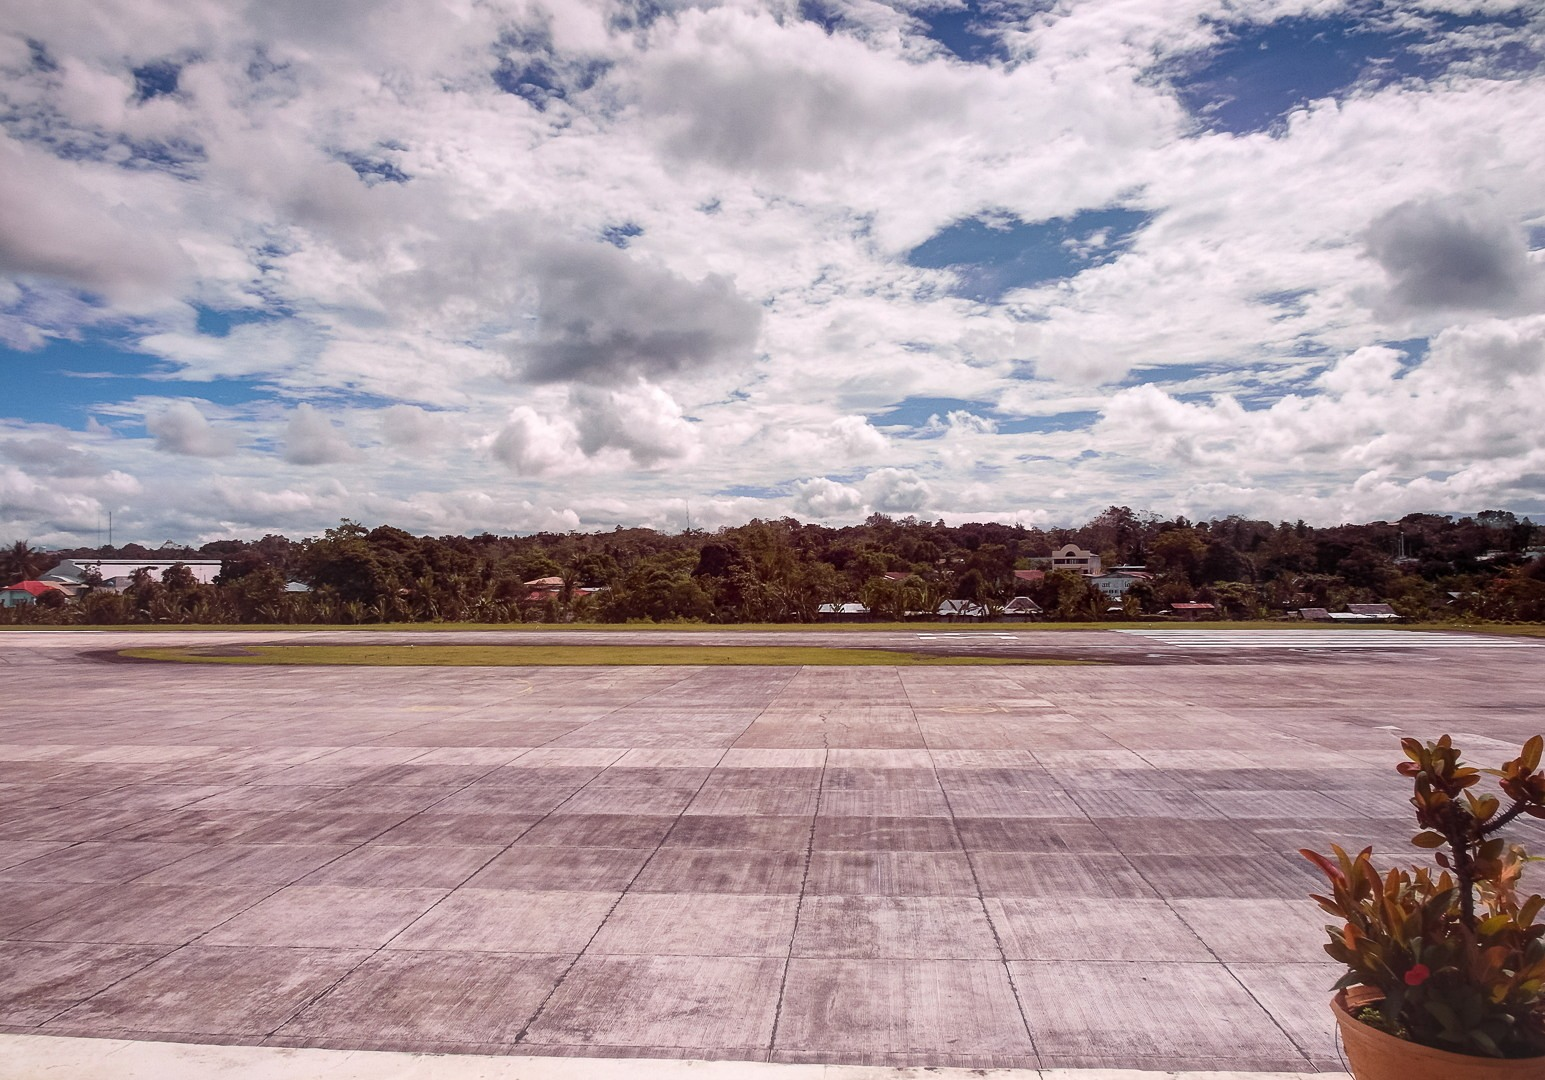 Airstrip at the airport in Tagbilaran, Philippines